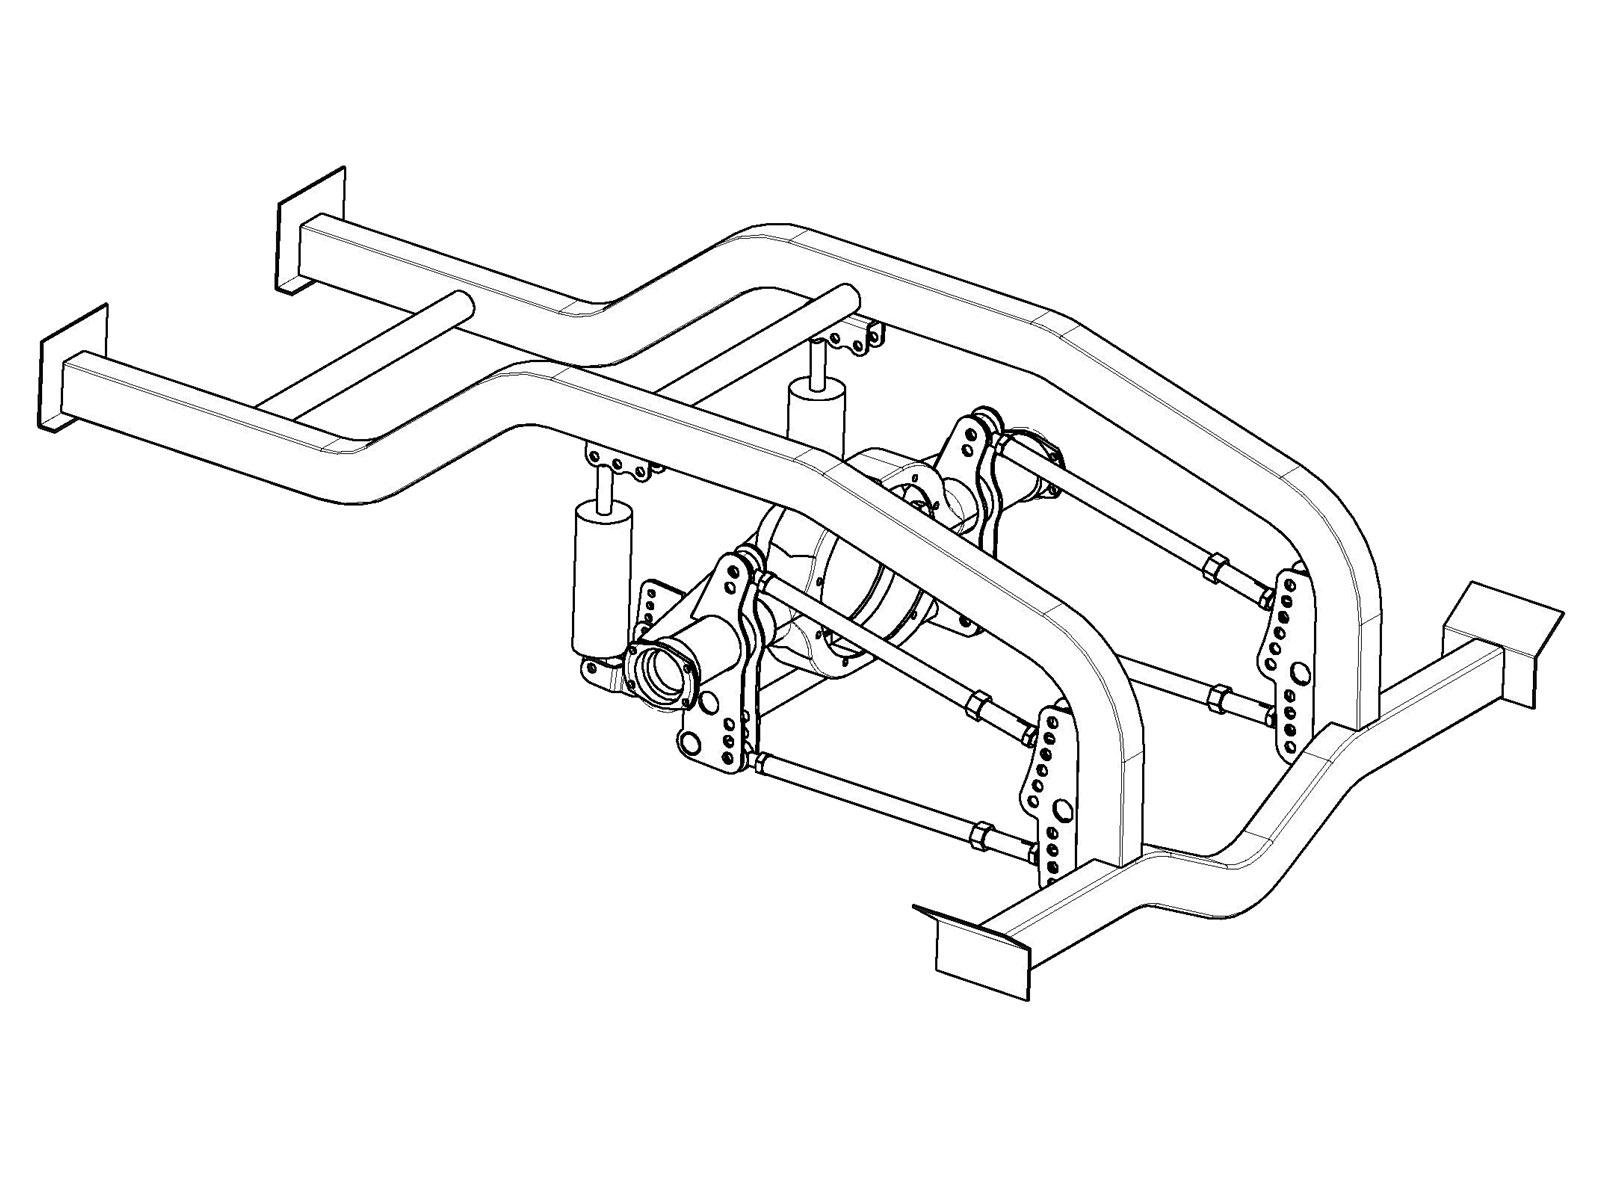 4 Link Pro Mod Suspension Kit Fits Dana Also 1 25